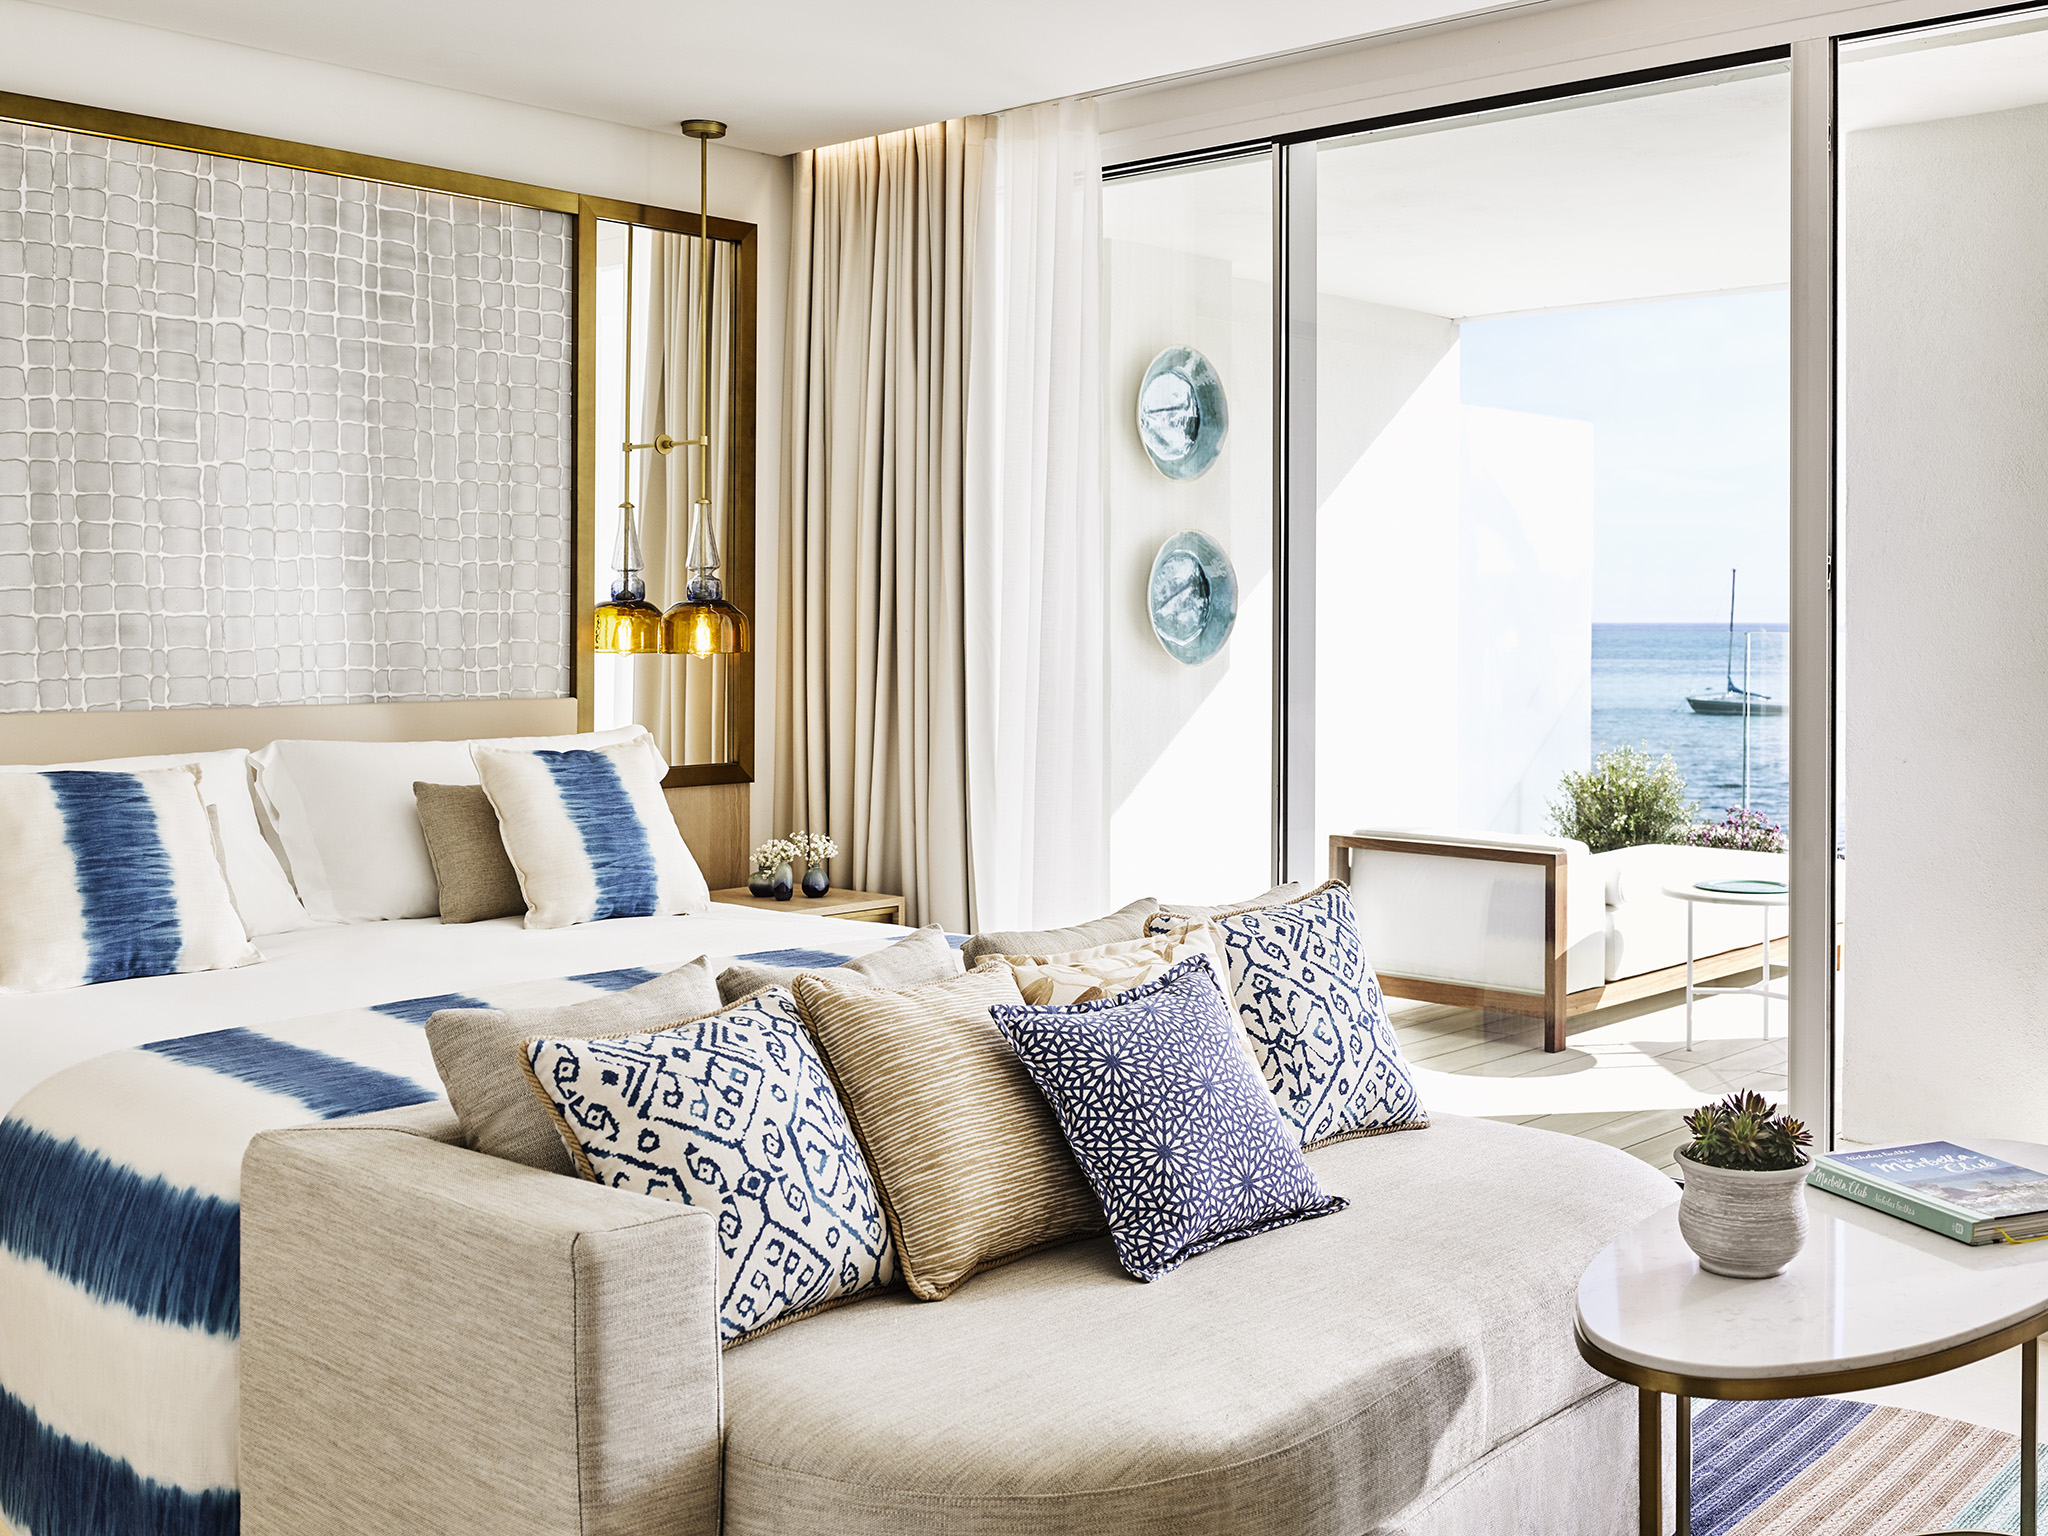 tailor-made-luxury-holiday-ibiza